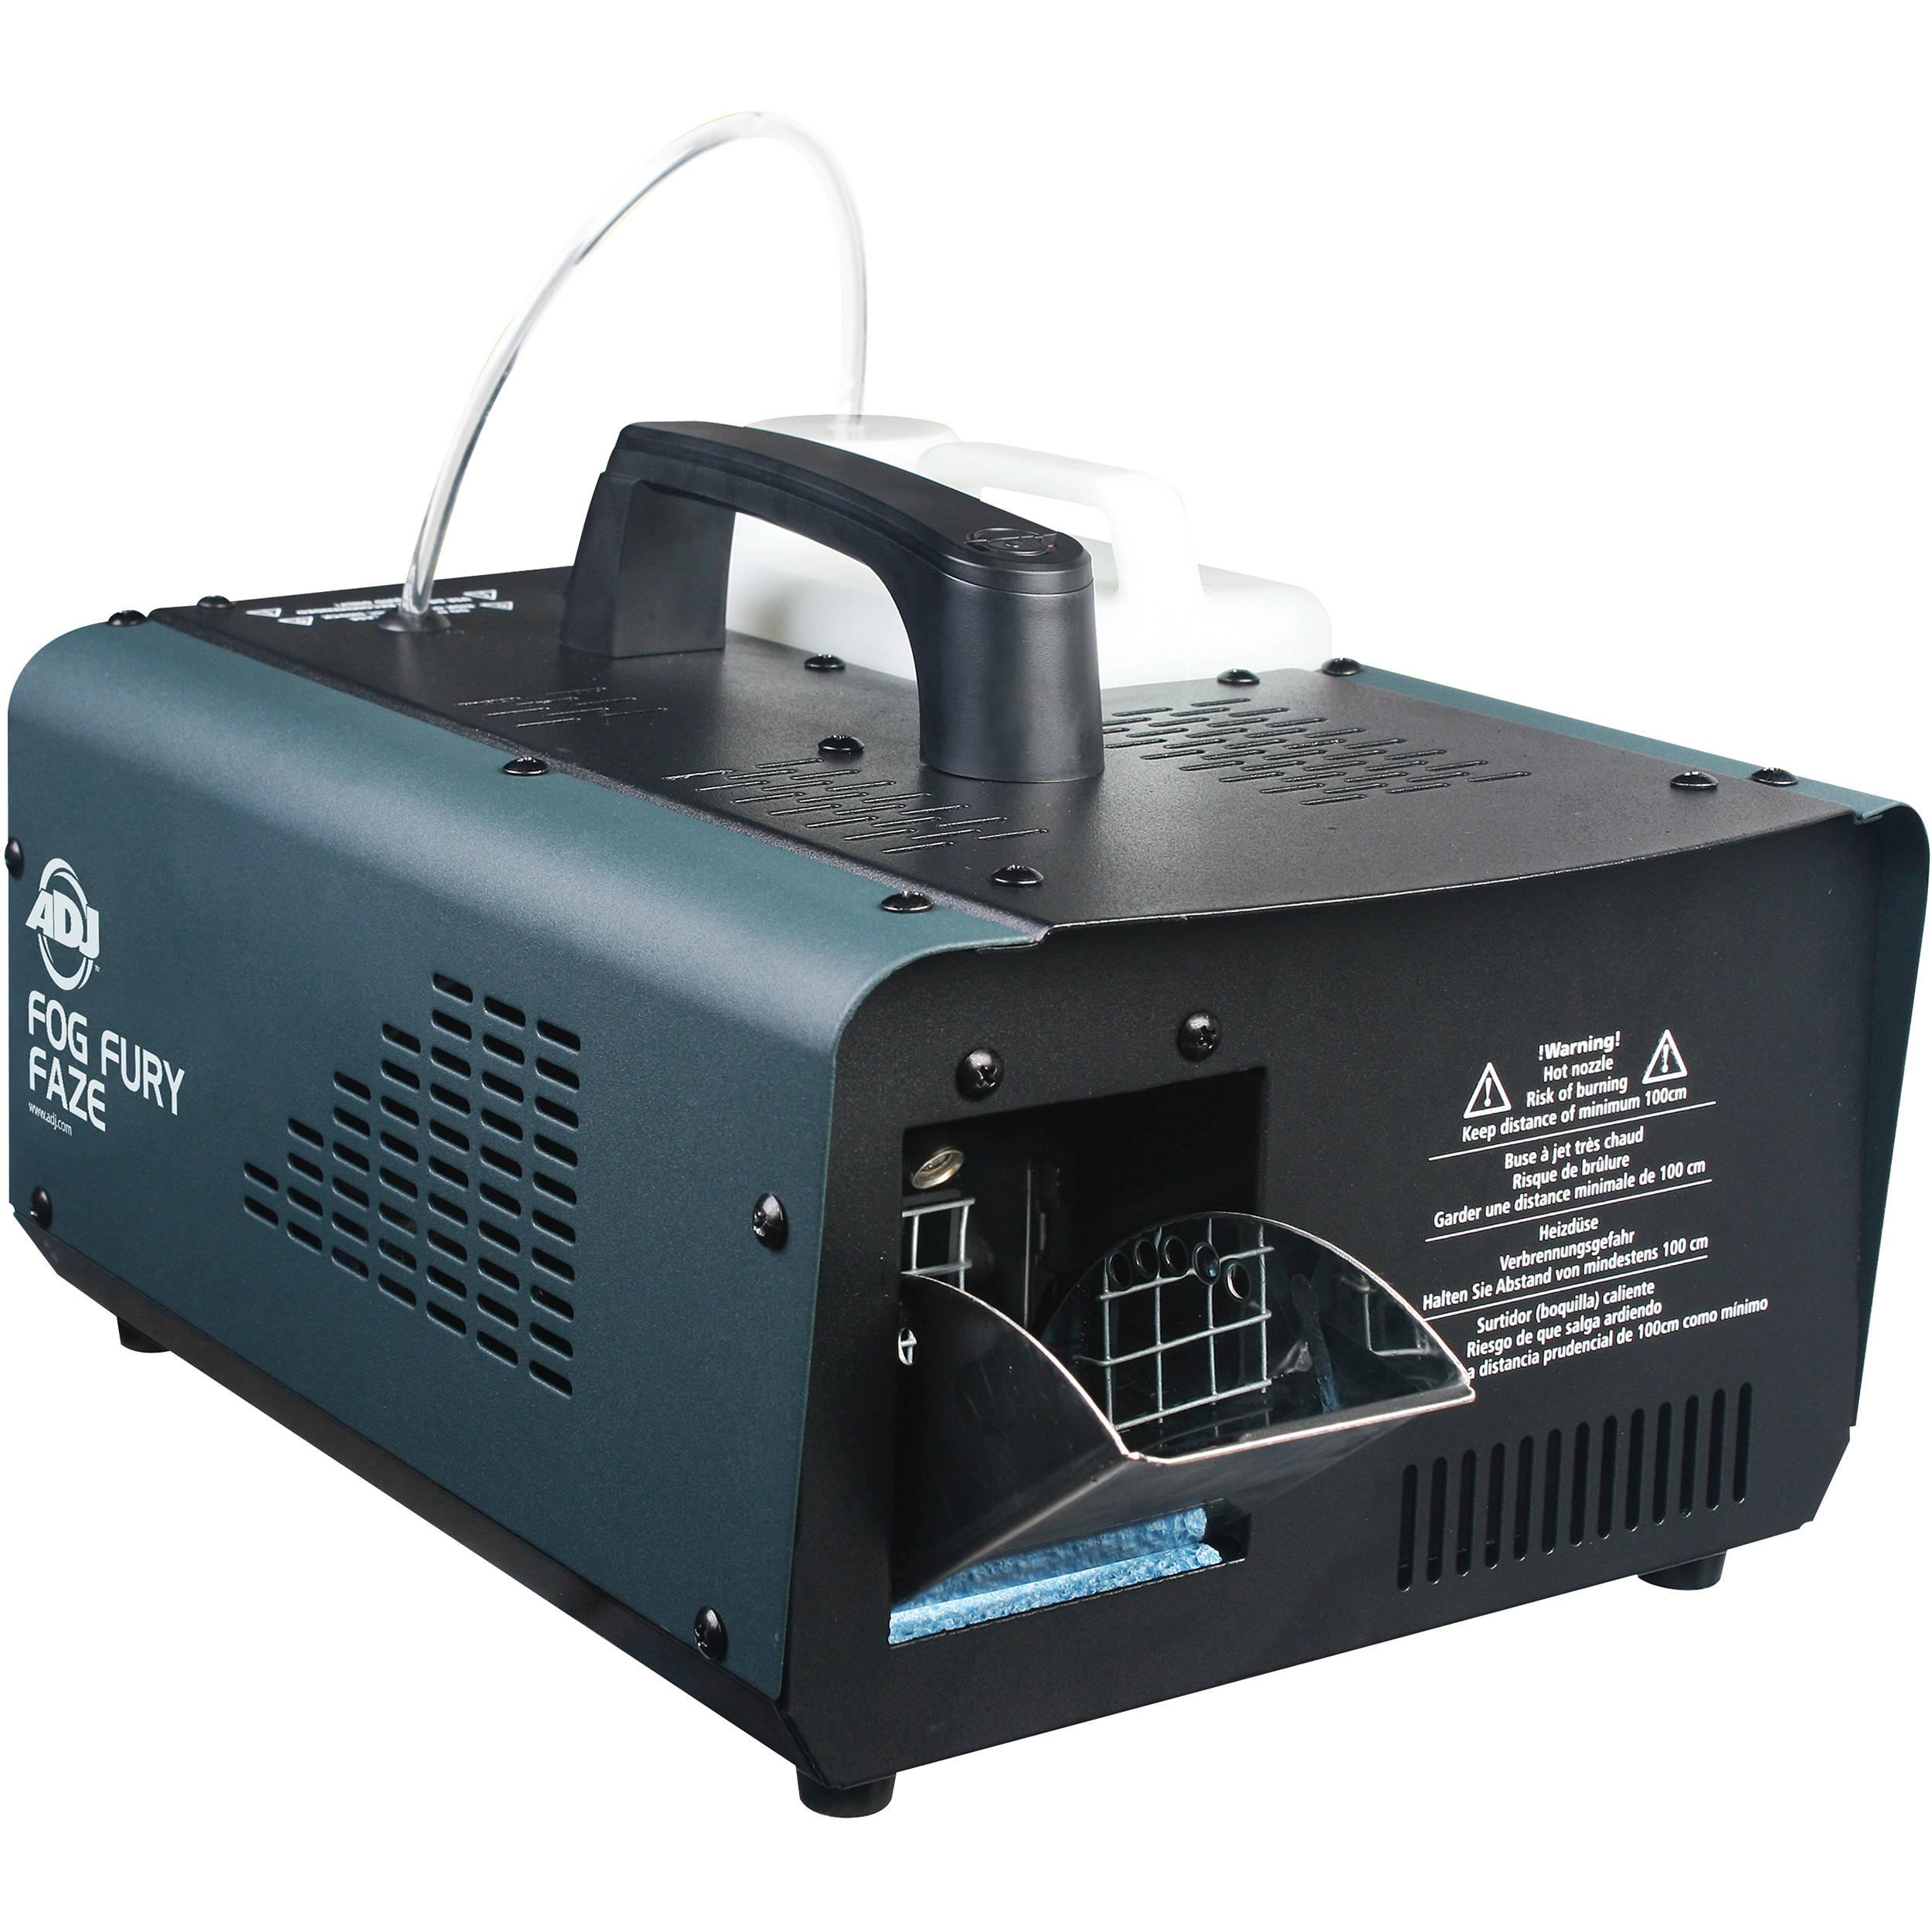 wrg 9303 faze 3 fuse box handle rh 10 ldancymru org uk